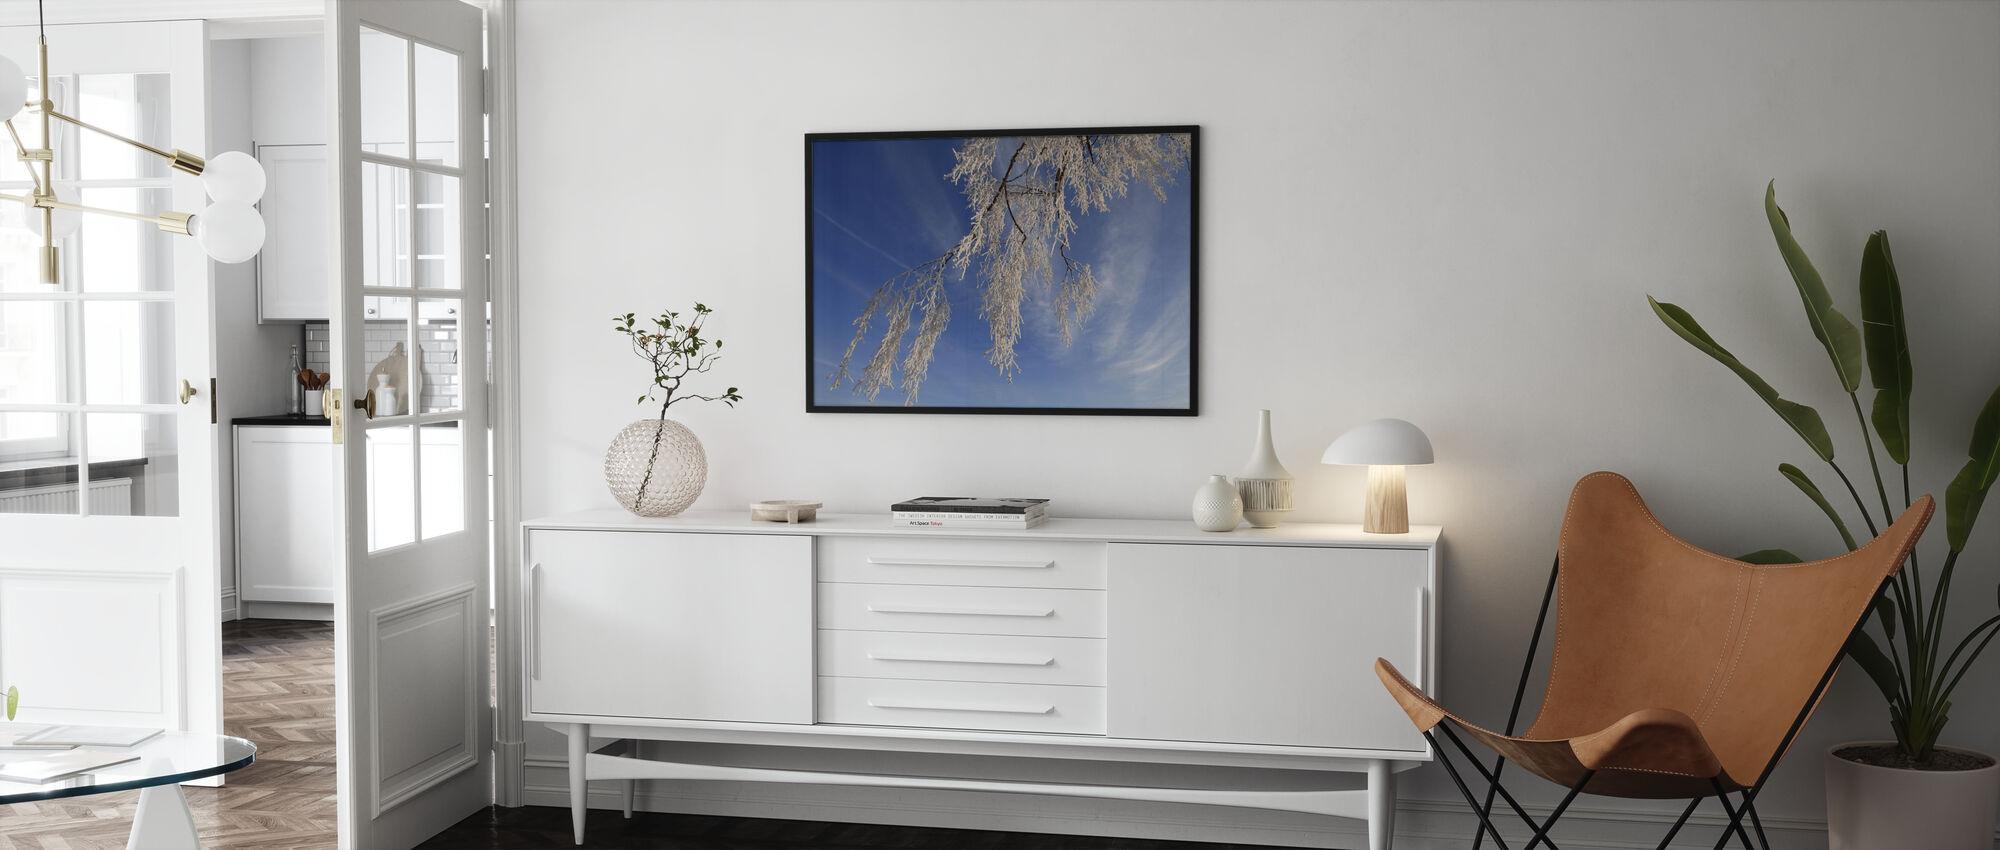 Frozen Branch - Poster - Living Room